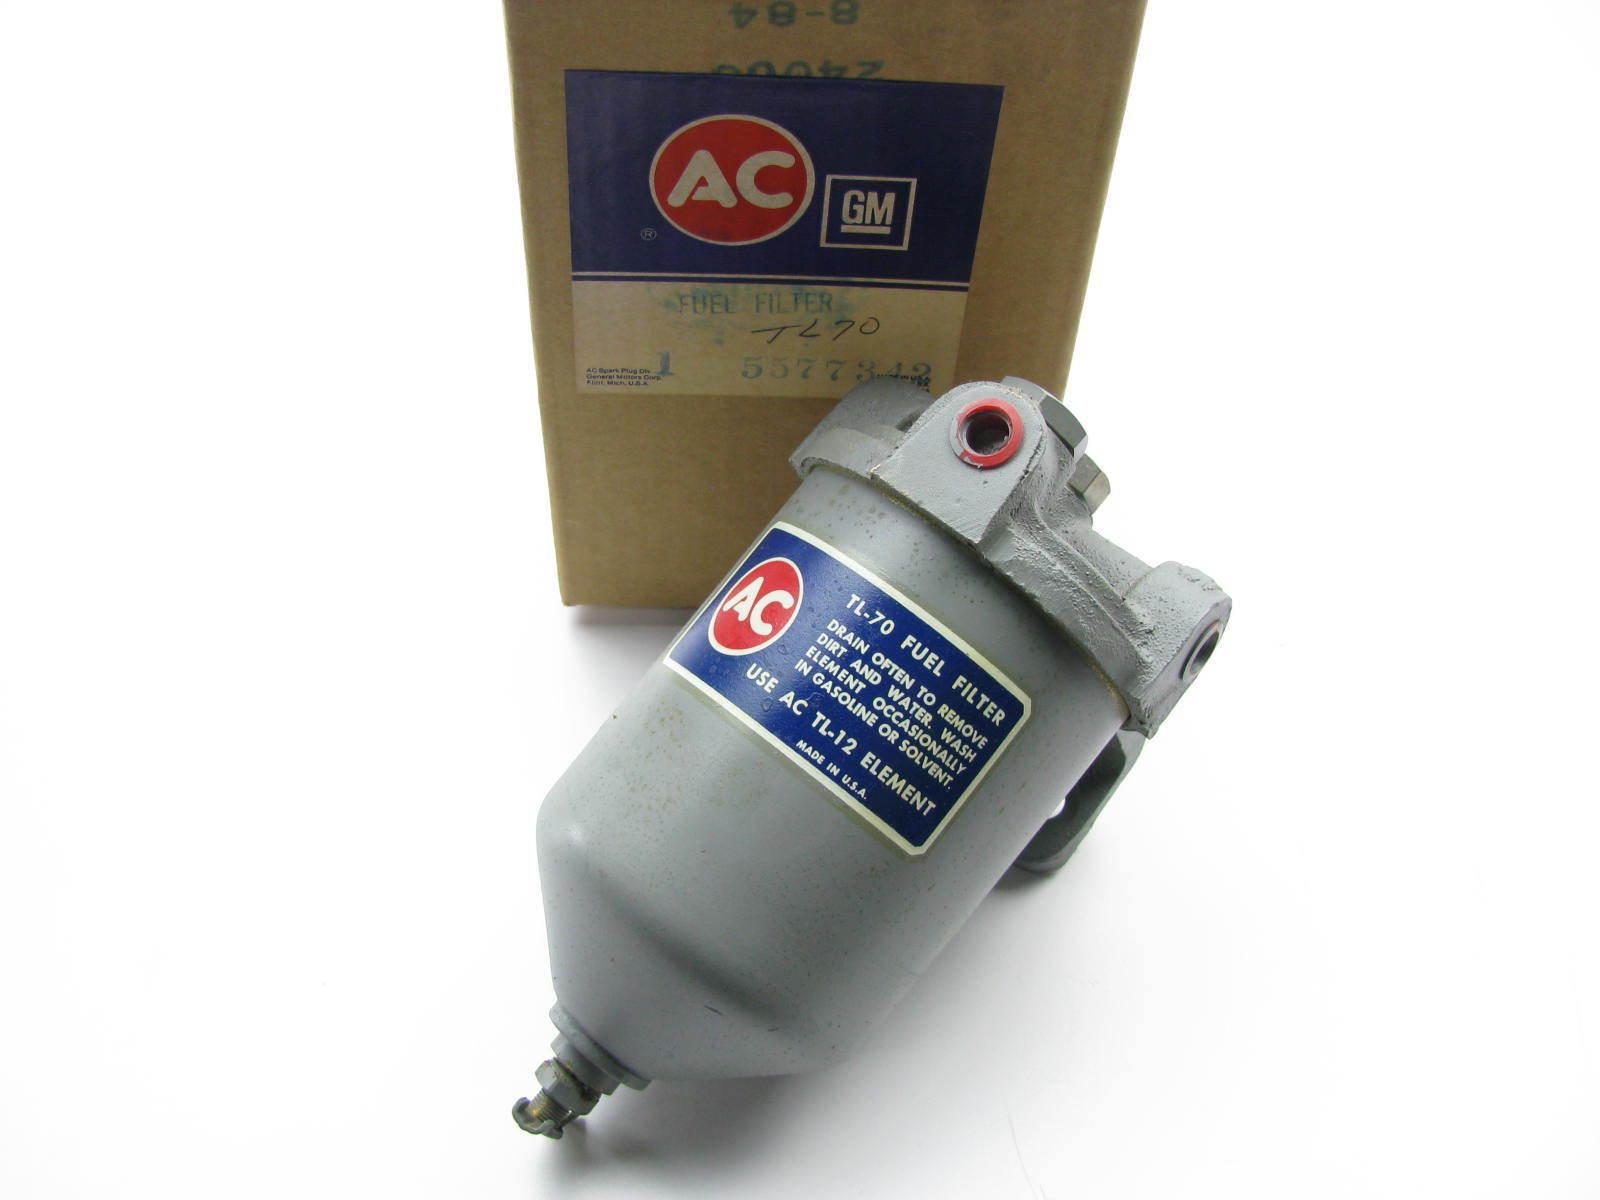 stationary generator diesel equipment heavy duty ac delco 5577342